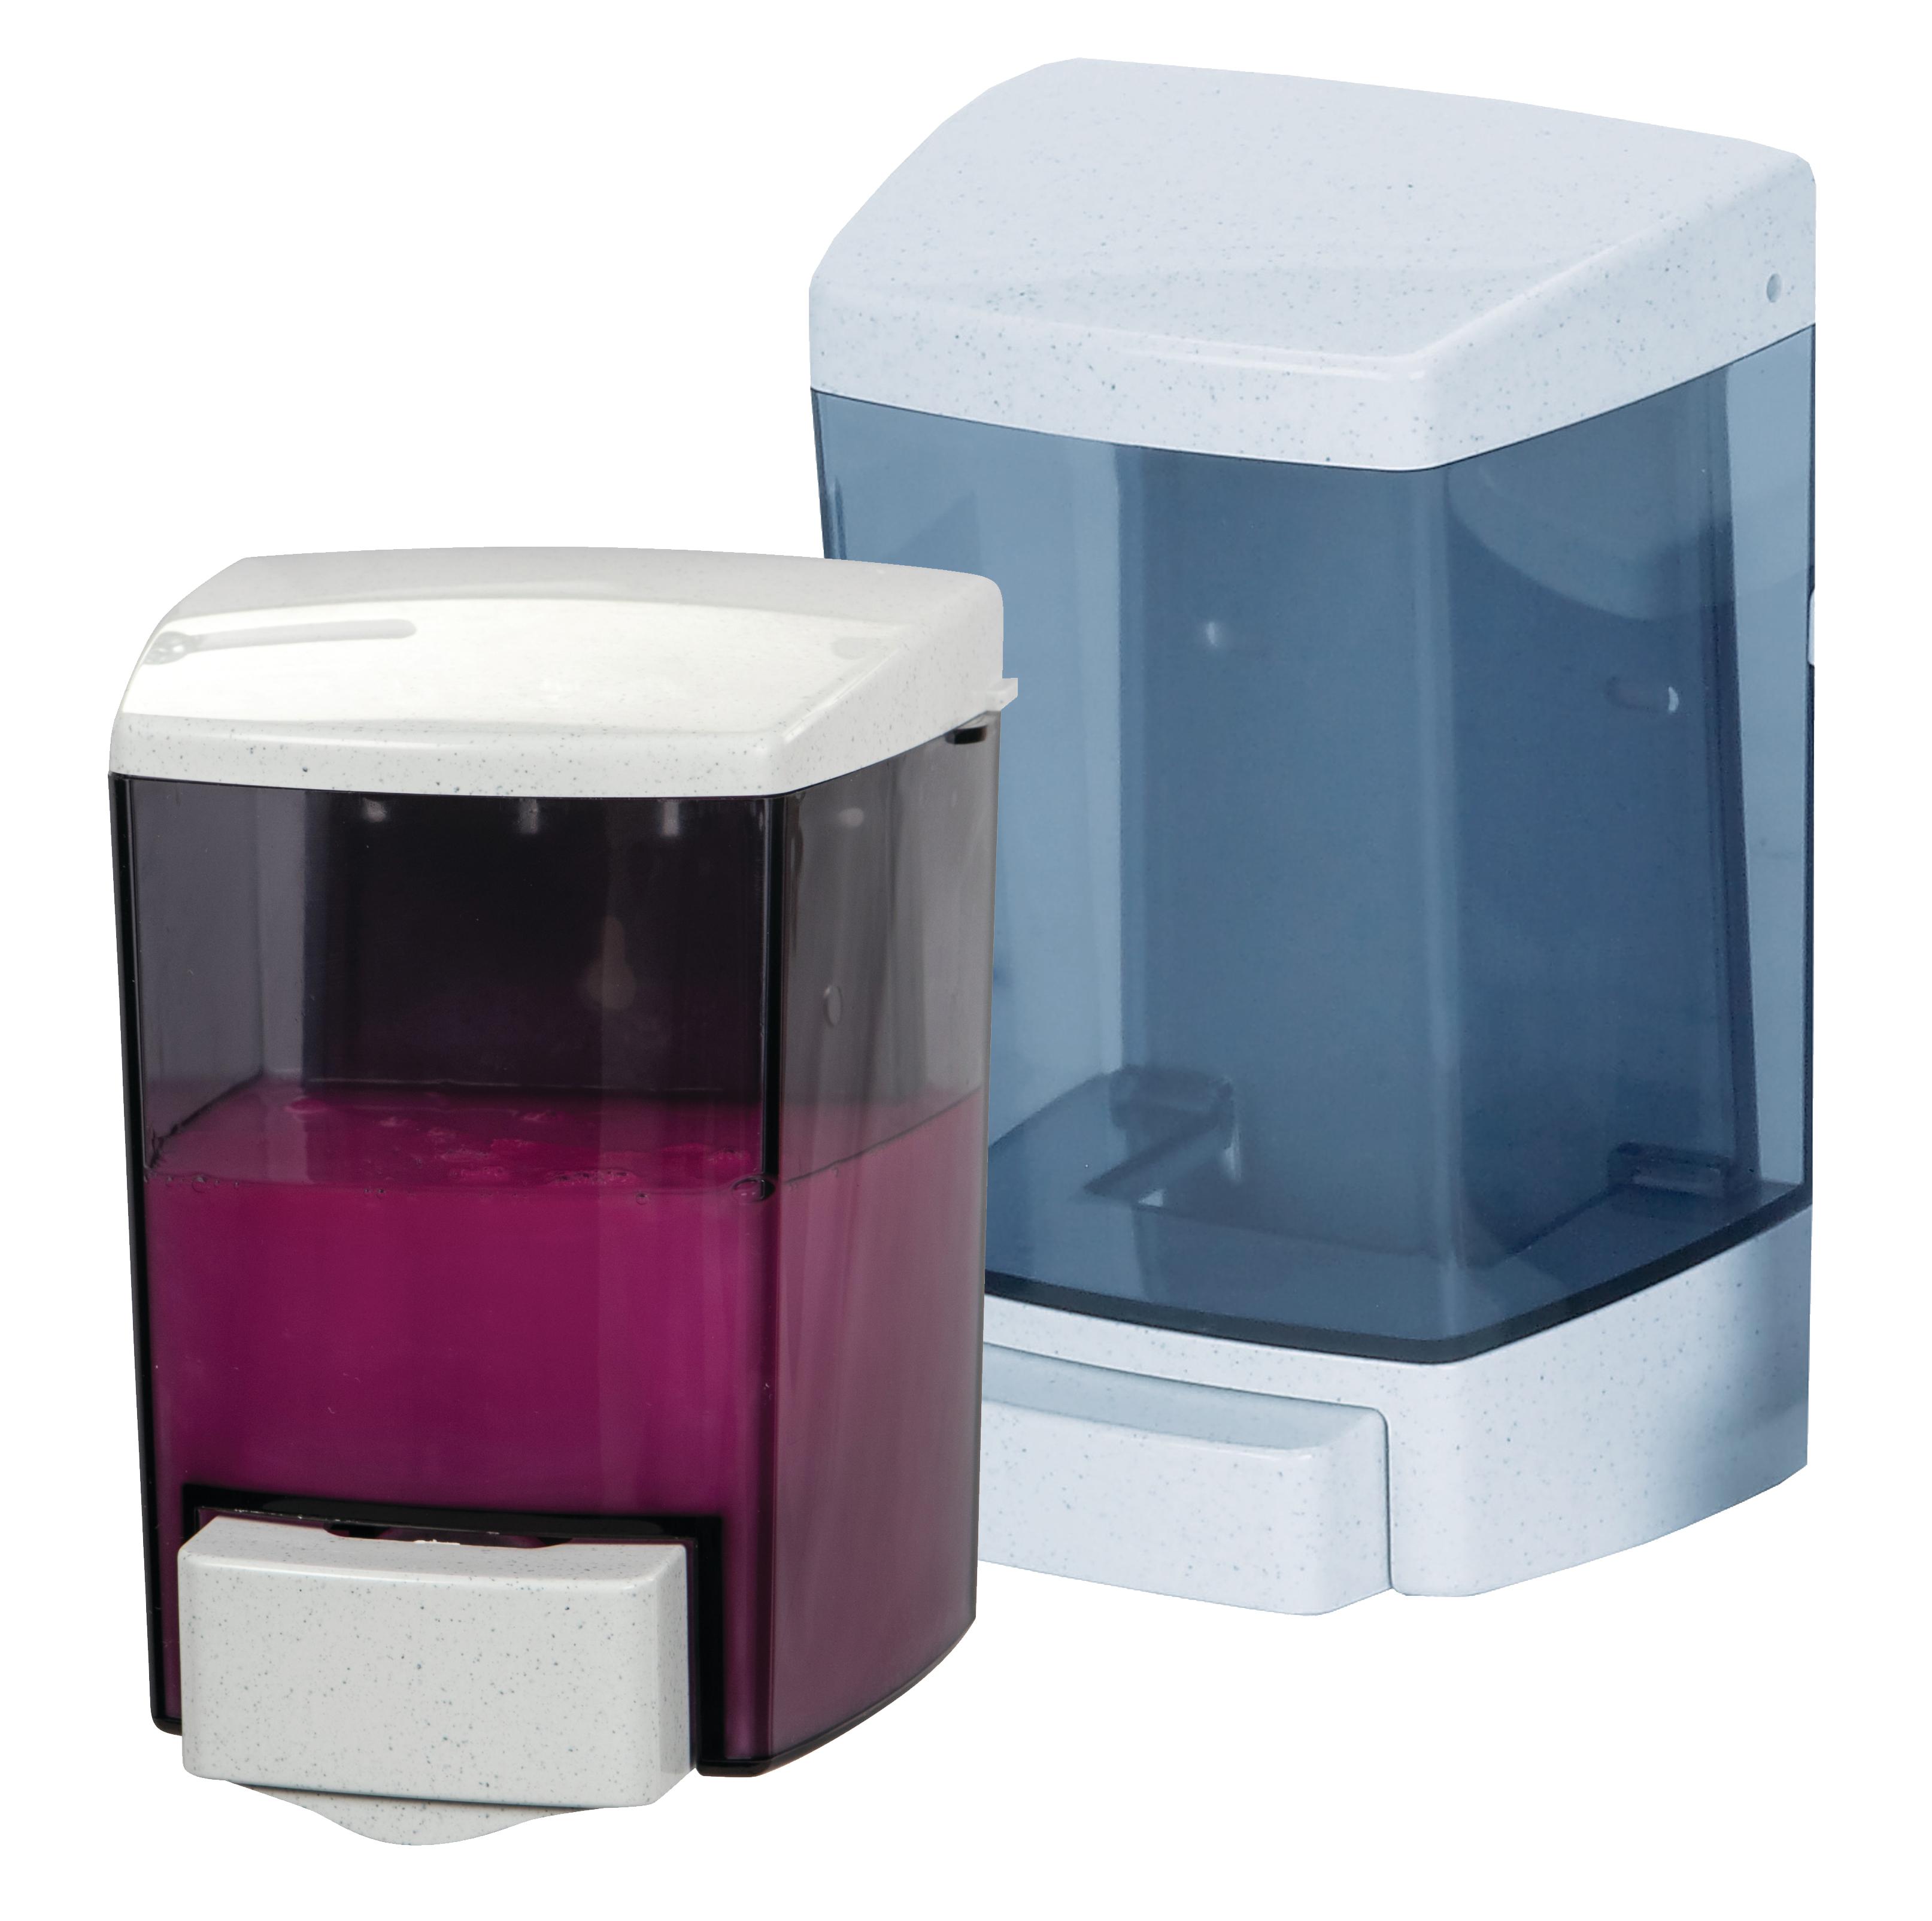 Soap Dispensers - Lotion, Liquid or Foam